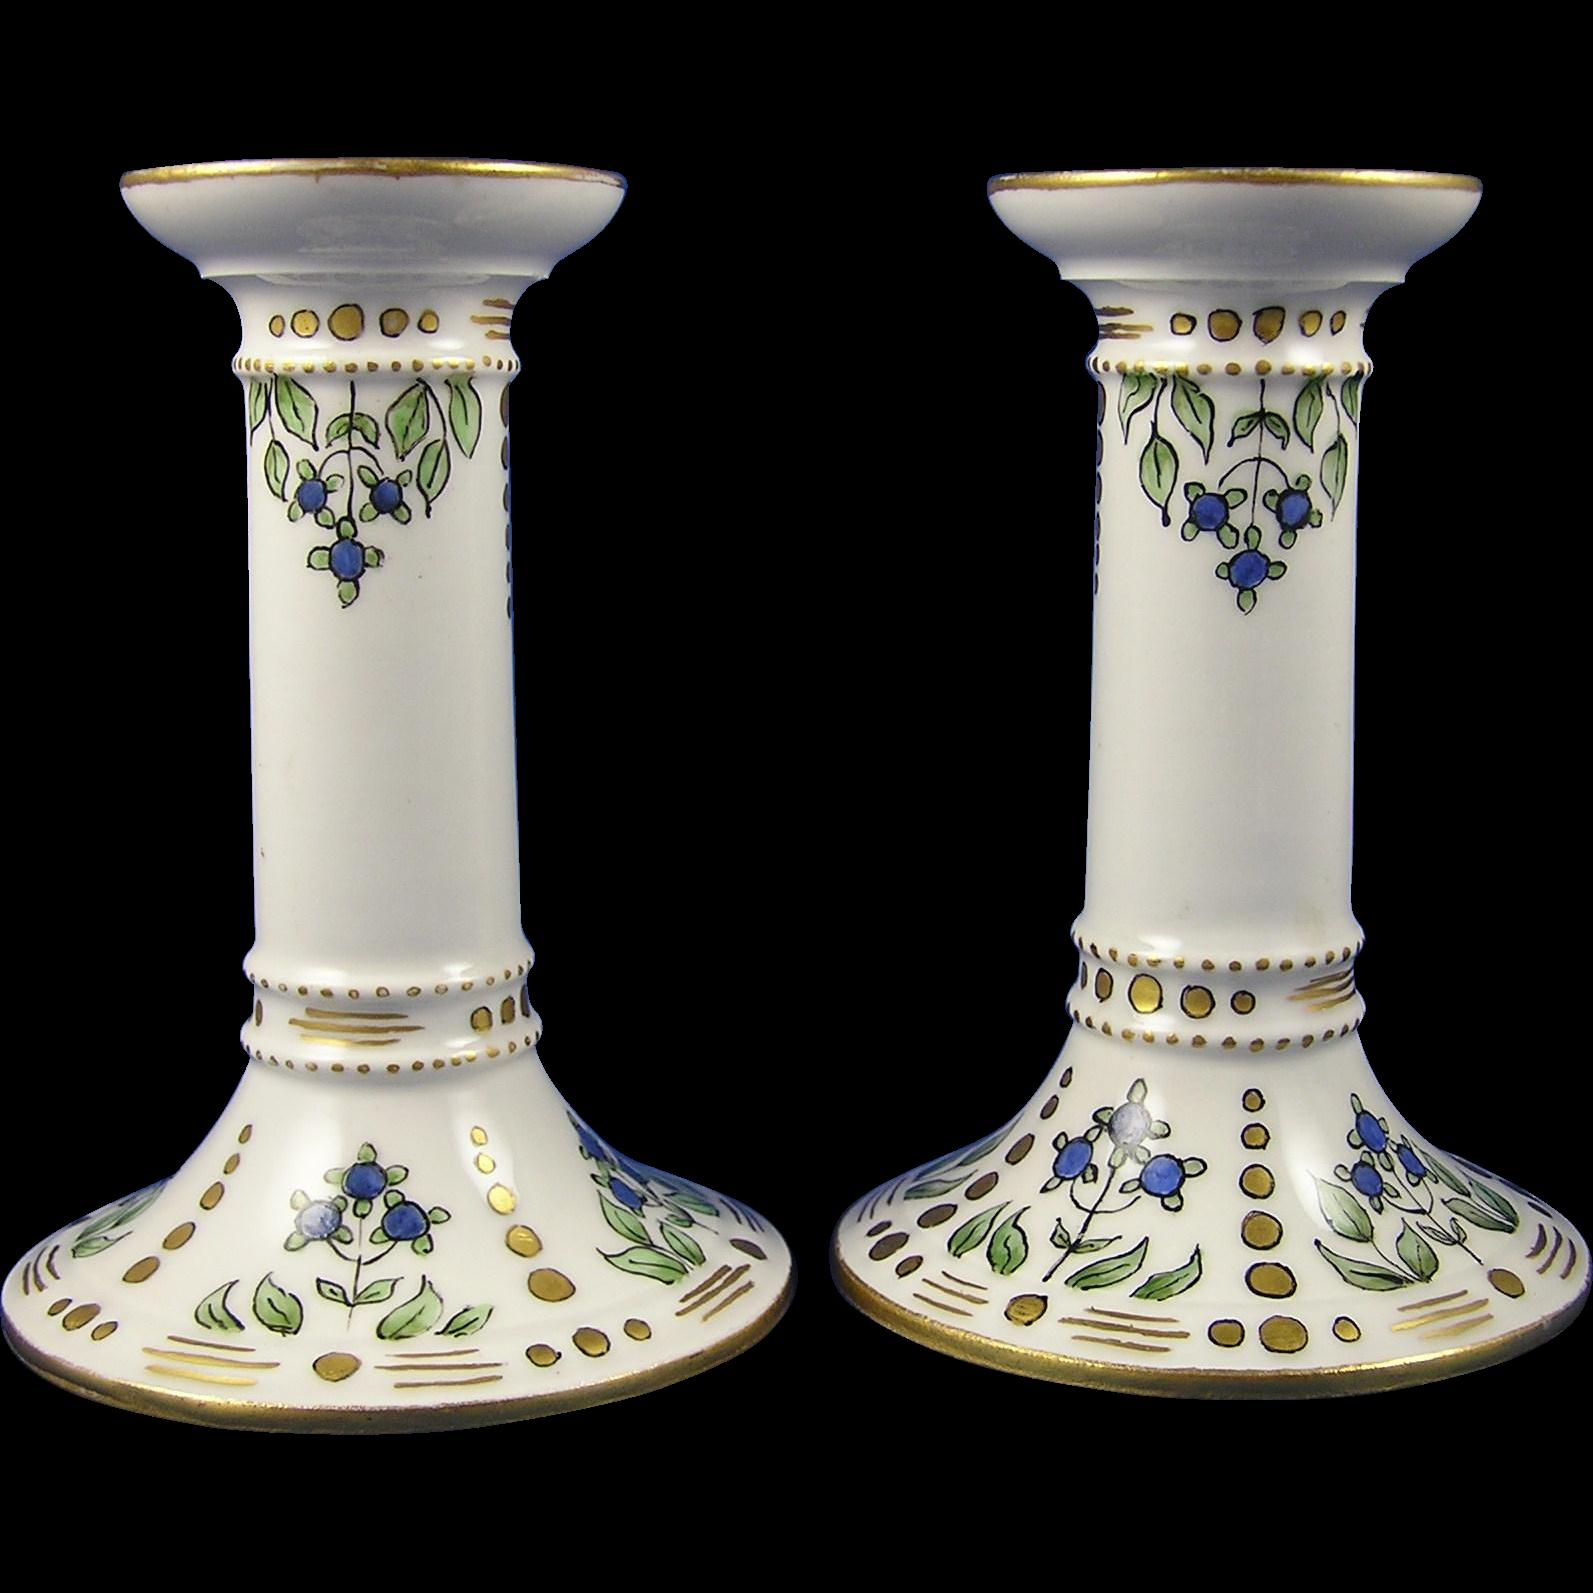 Legrand Limoges Arts & Crafts Blueberry Motif Candlesticks (c. 1920's)